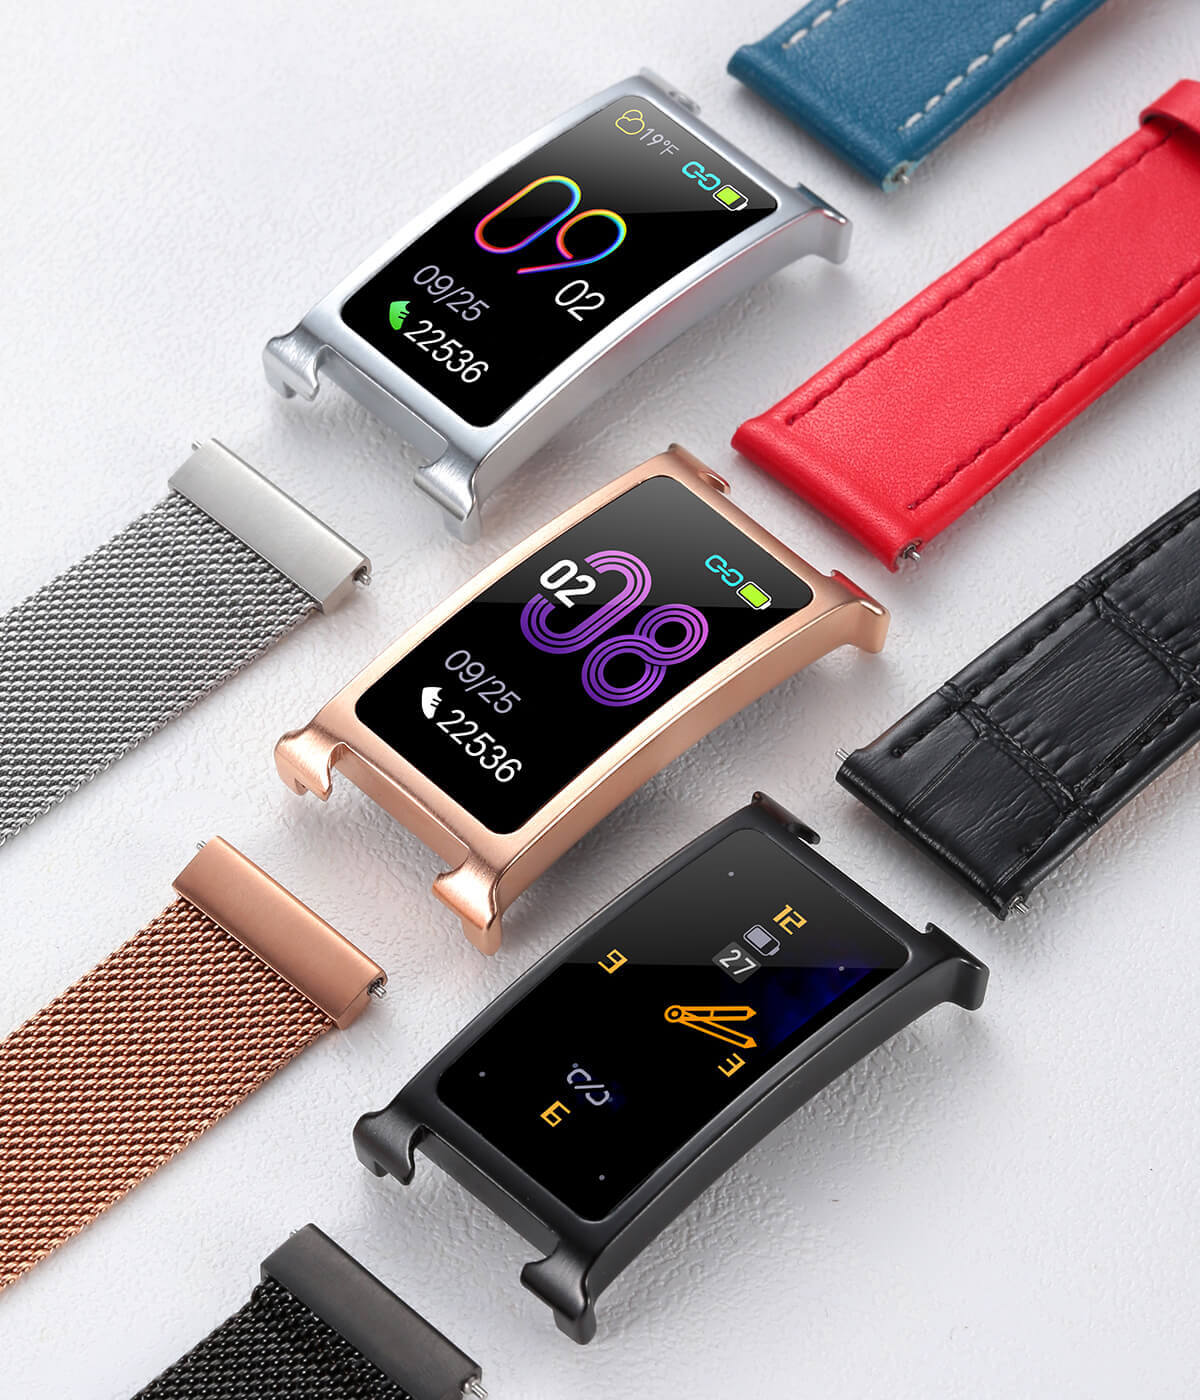 Chytrý kovový fitness náramek Smartomat Silentband 2 chytré hodinky 4